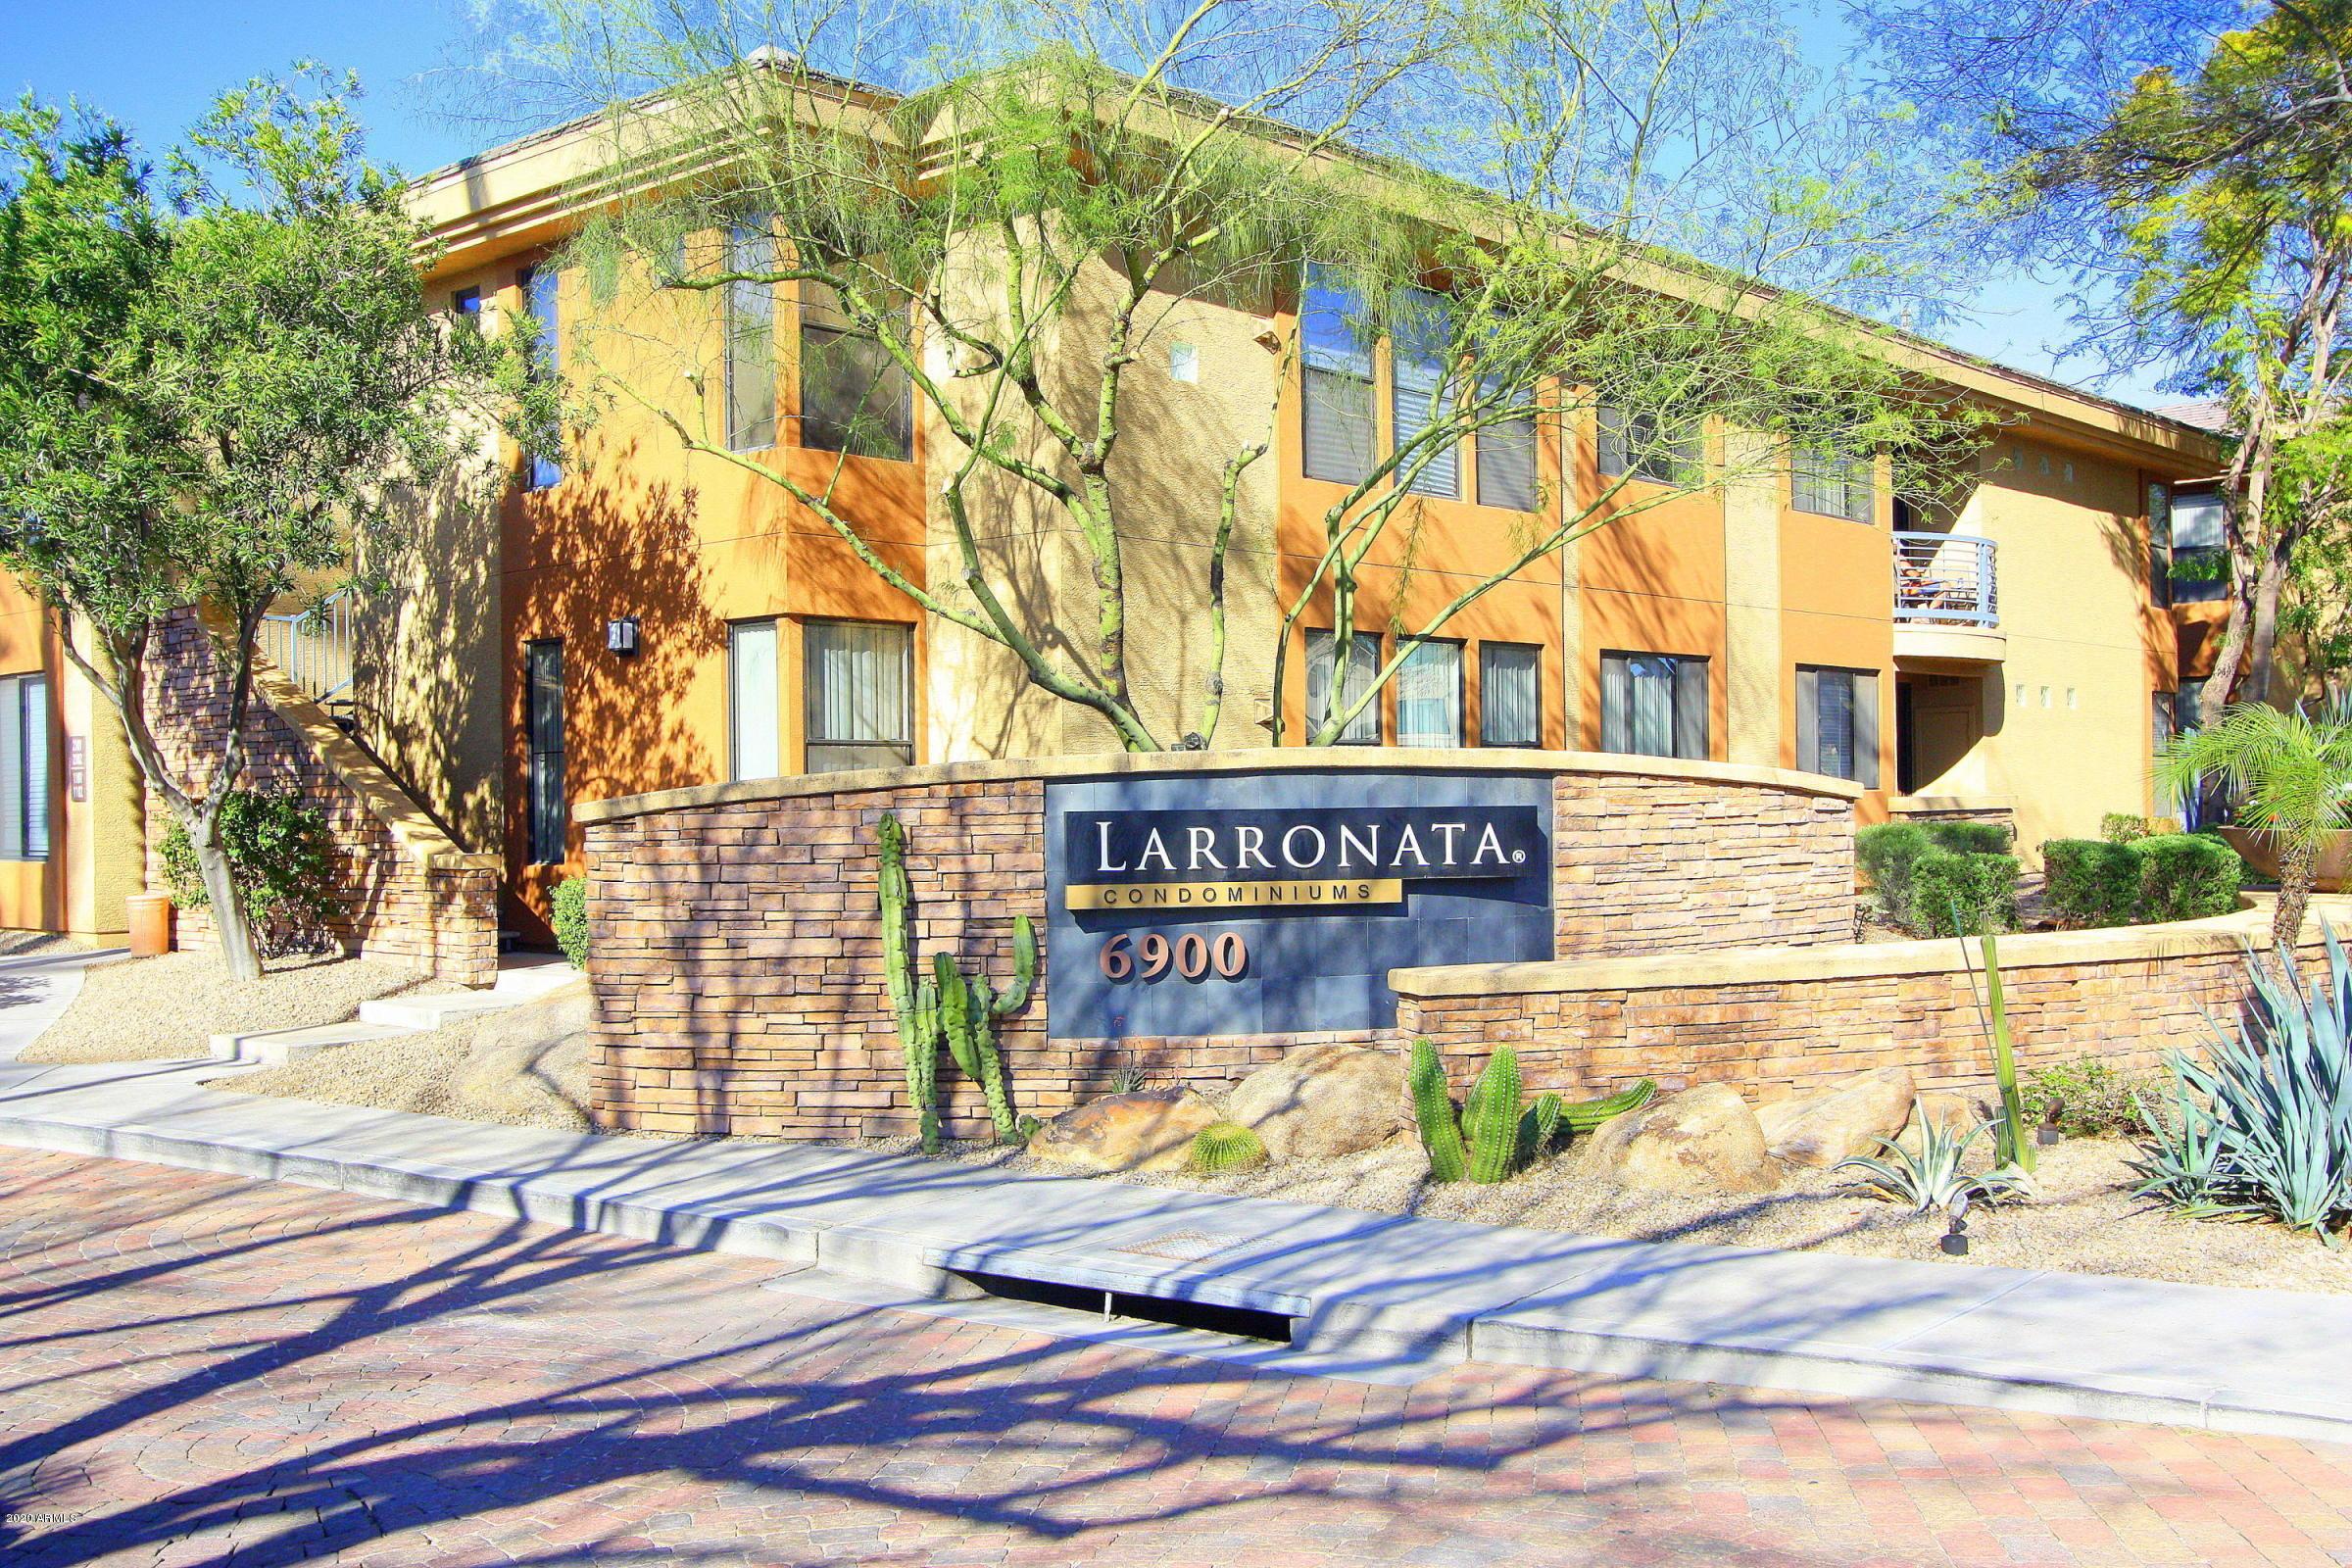 6900 PRINCESS Drive, Phoenix, Arizona 85054, 2 Bedrooms Bedrooms, ,2 BathroomsBathrooms,Residential Rental,For Rent,PRINCESS,6153861